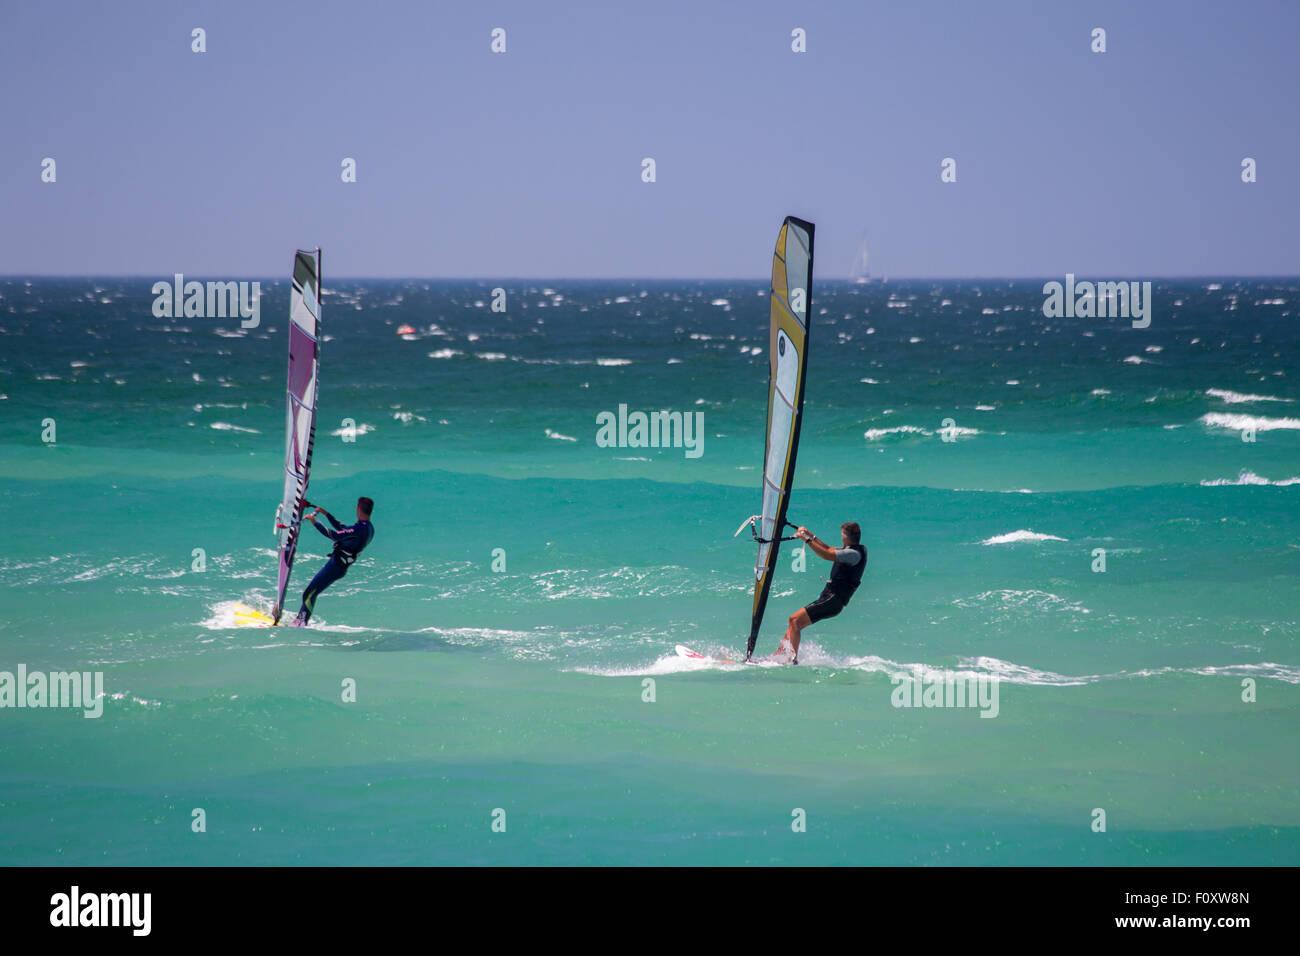 Windsurf en la playa de Guincho off cerca de Cascais, Portugal Foto de stock